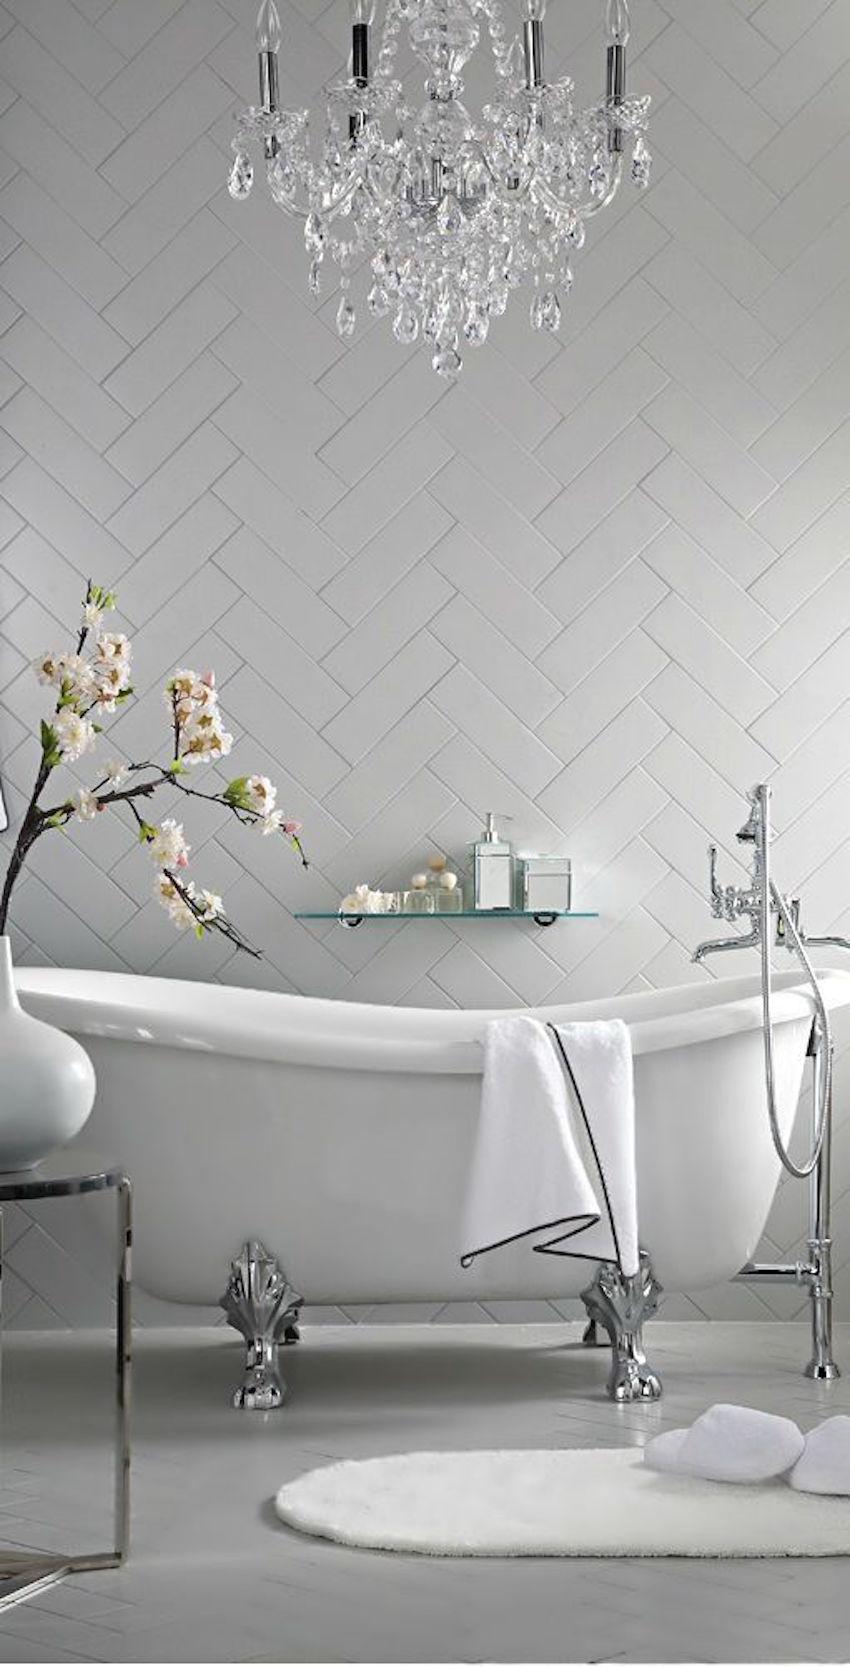 5 Golden Rules to Choose the Best Bathroom Chandelier